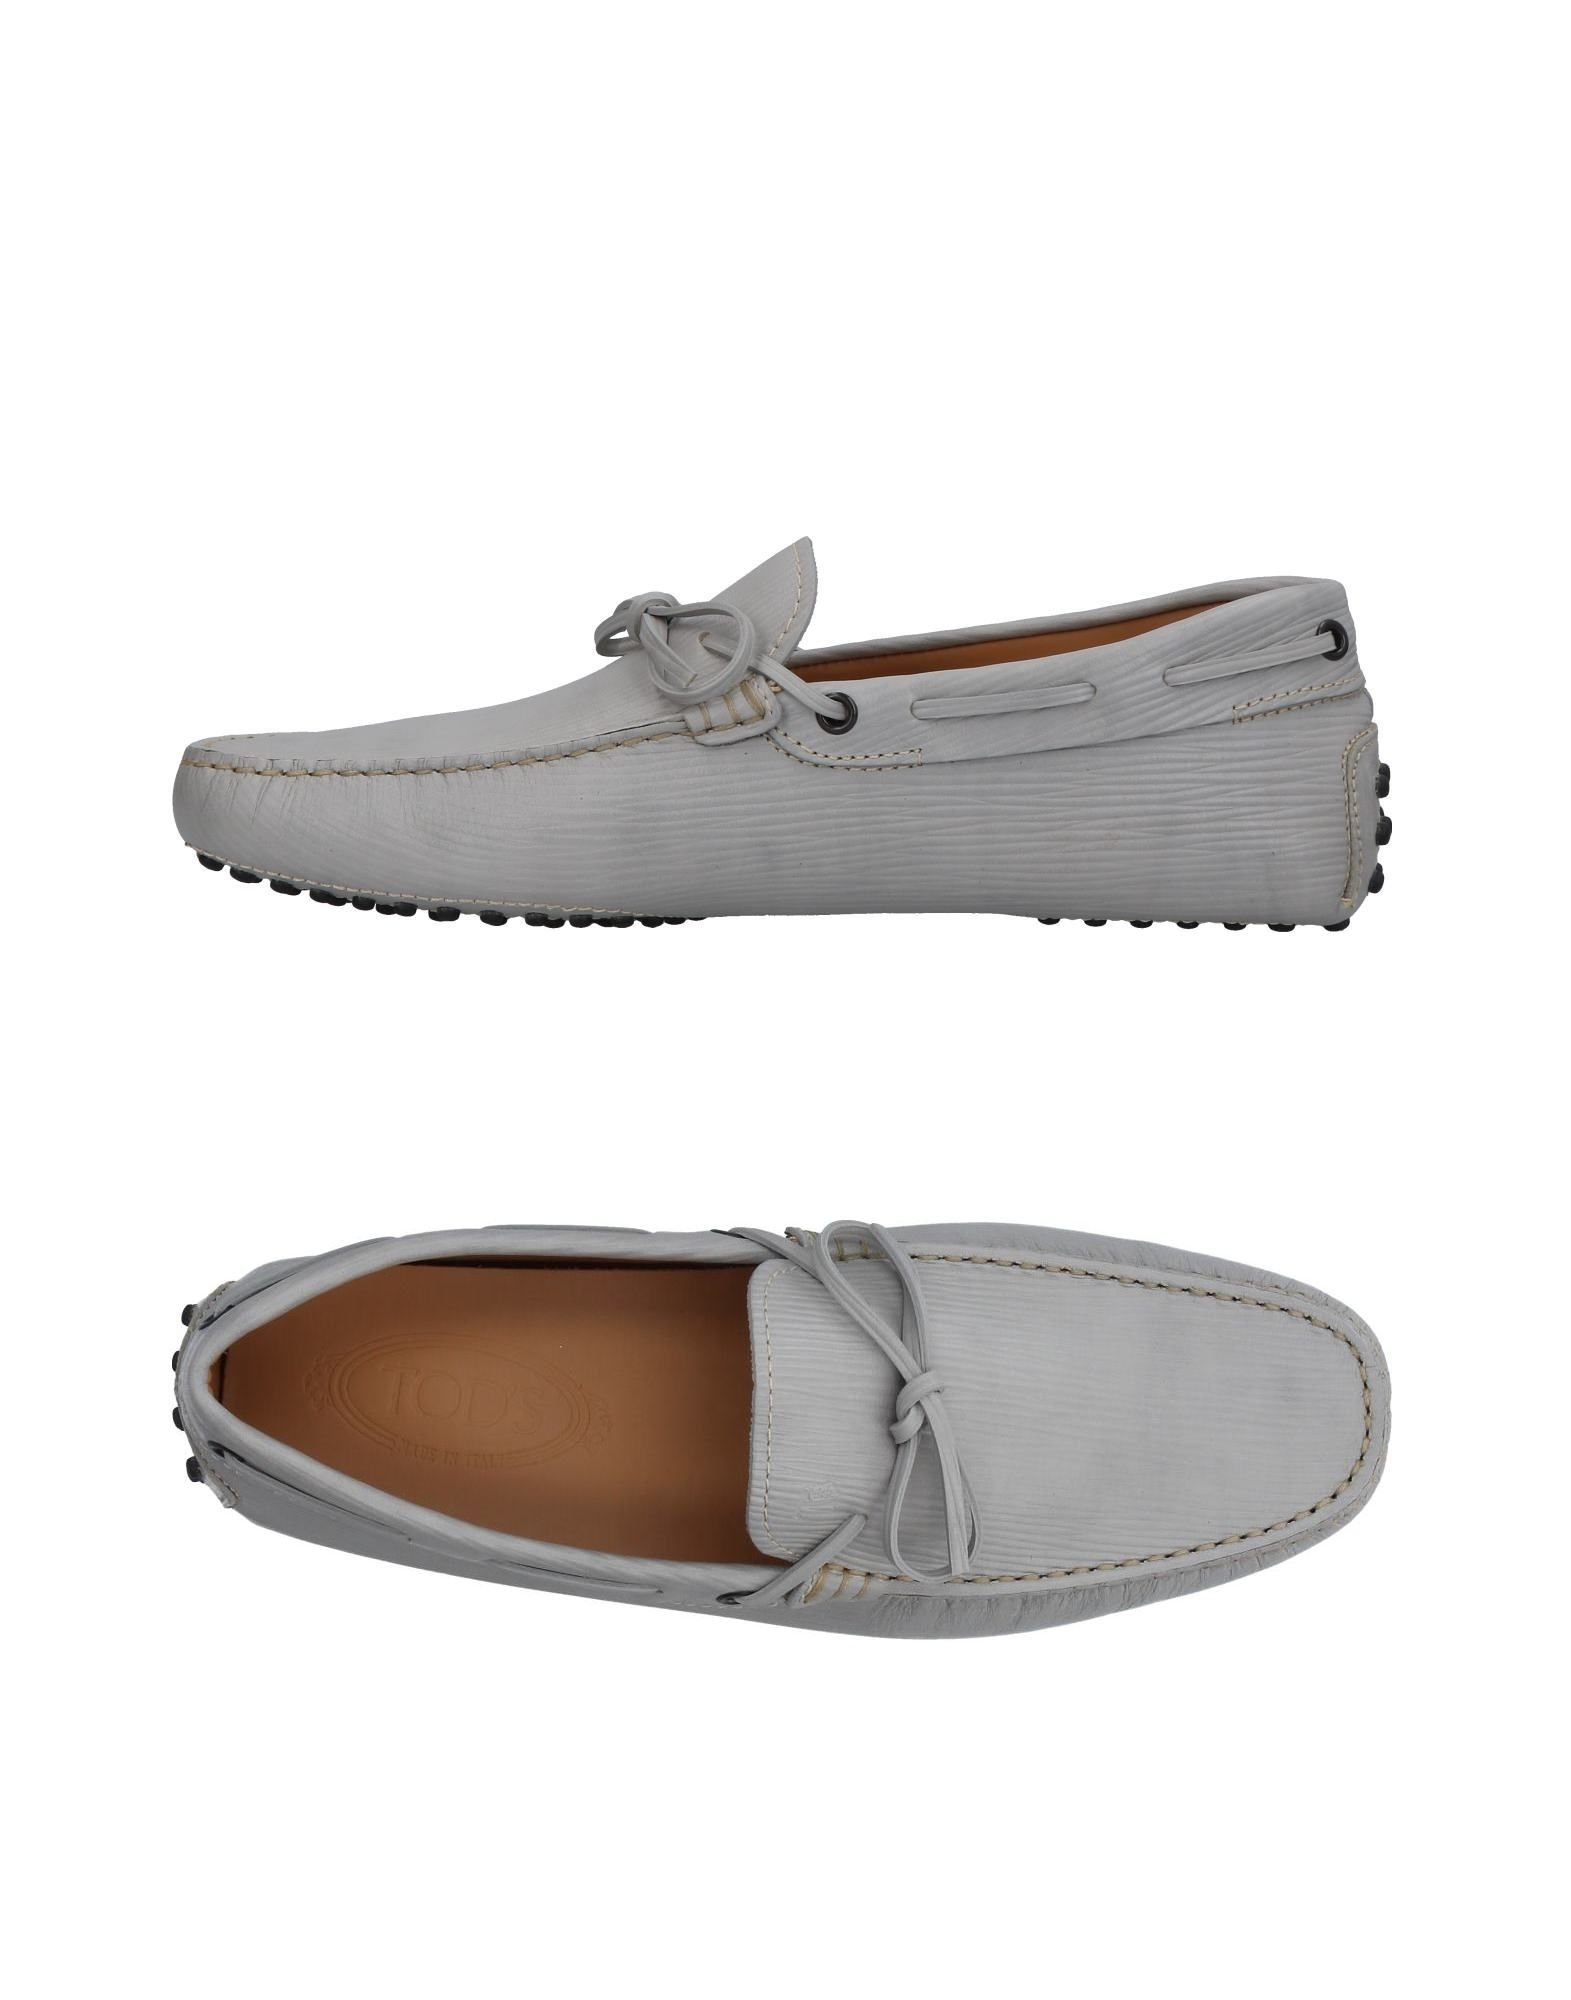 Tod's Mokassins Herren  11157996ME Gute Qualität beliebte Schuhe